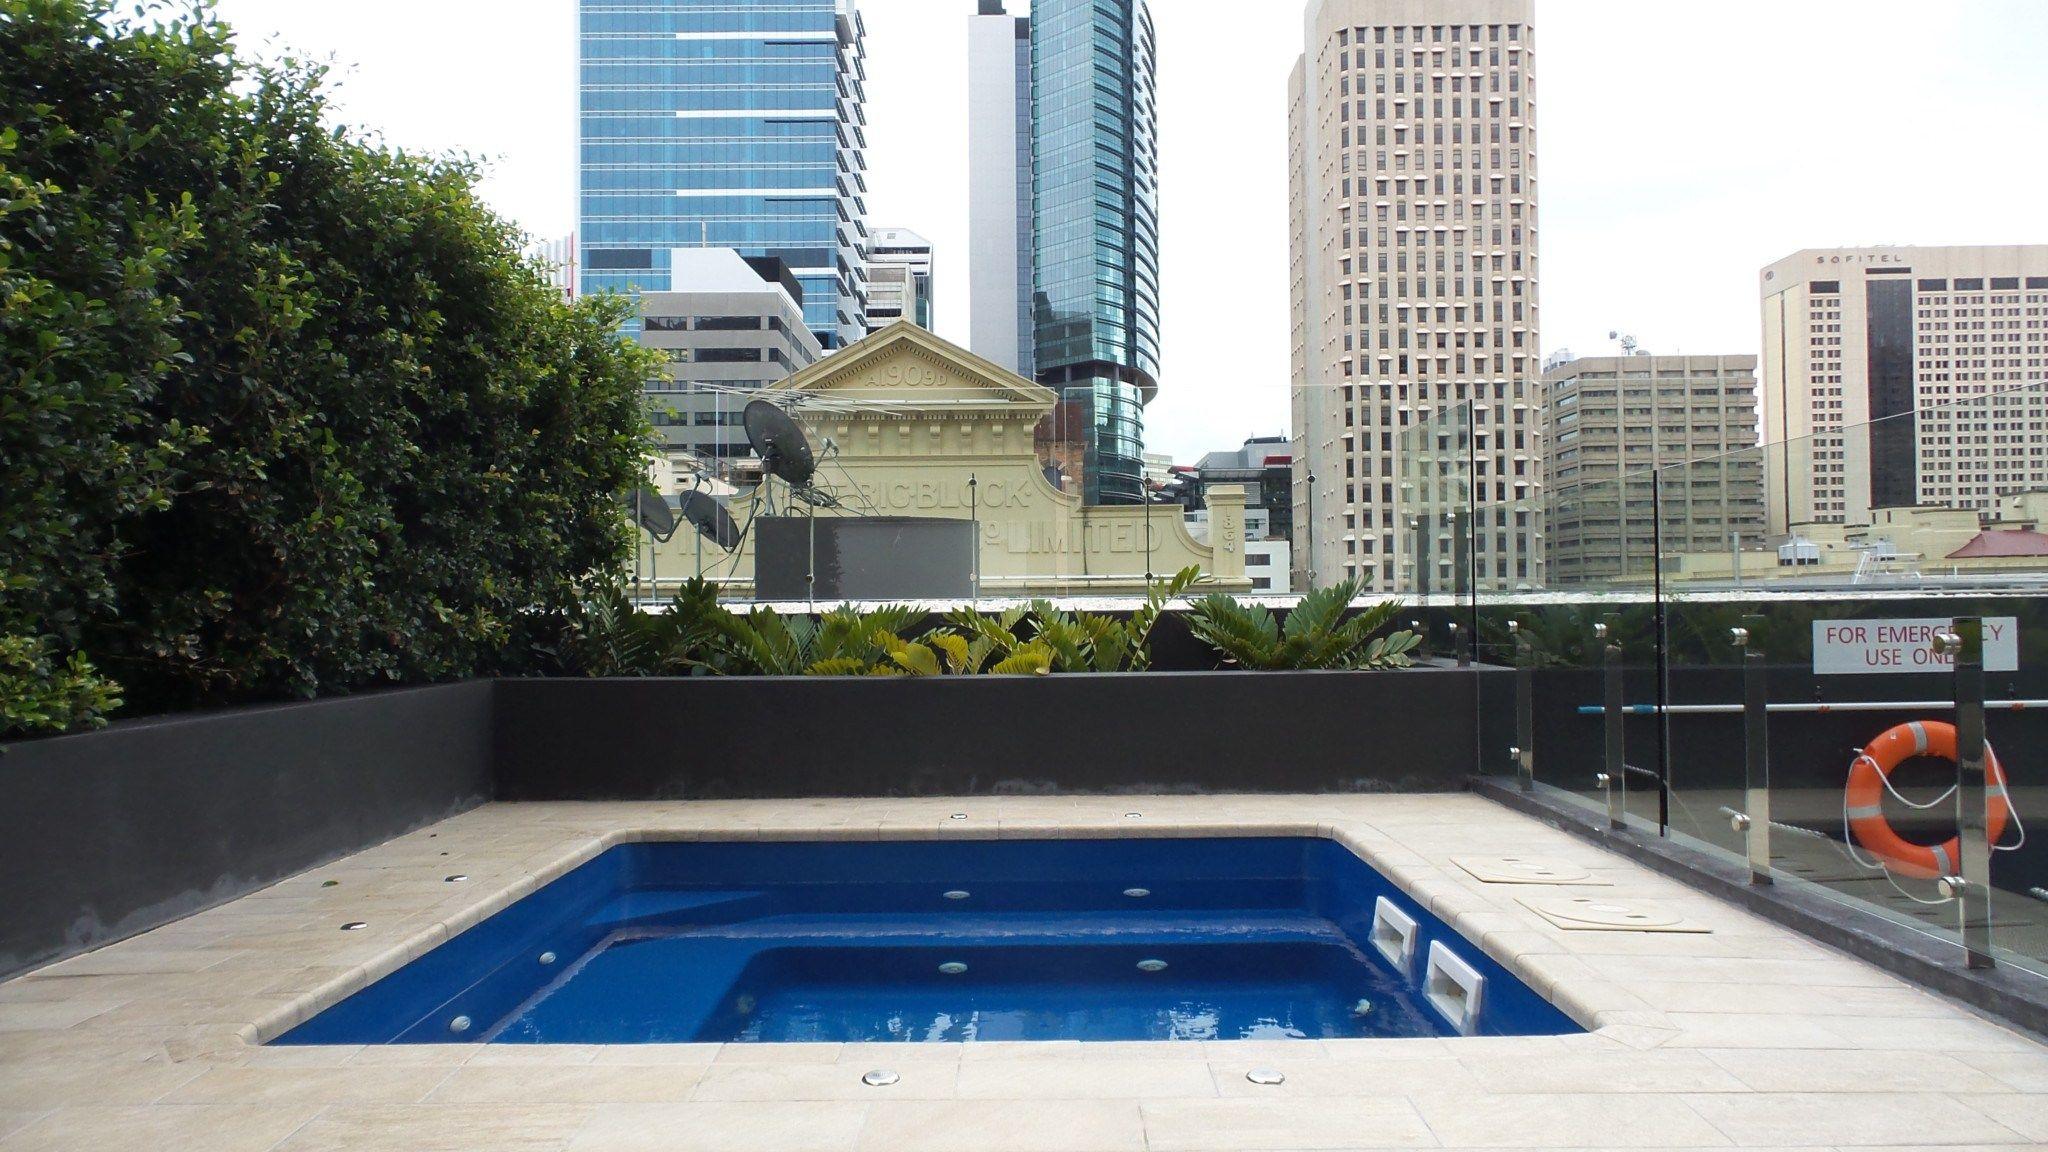 Pool Spa At The Hilton Brisbane Hotel Hilton Brisbane Spa